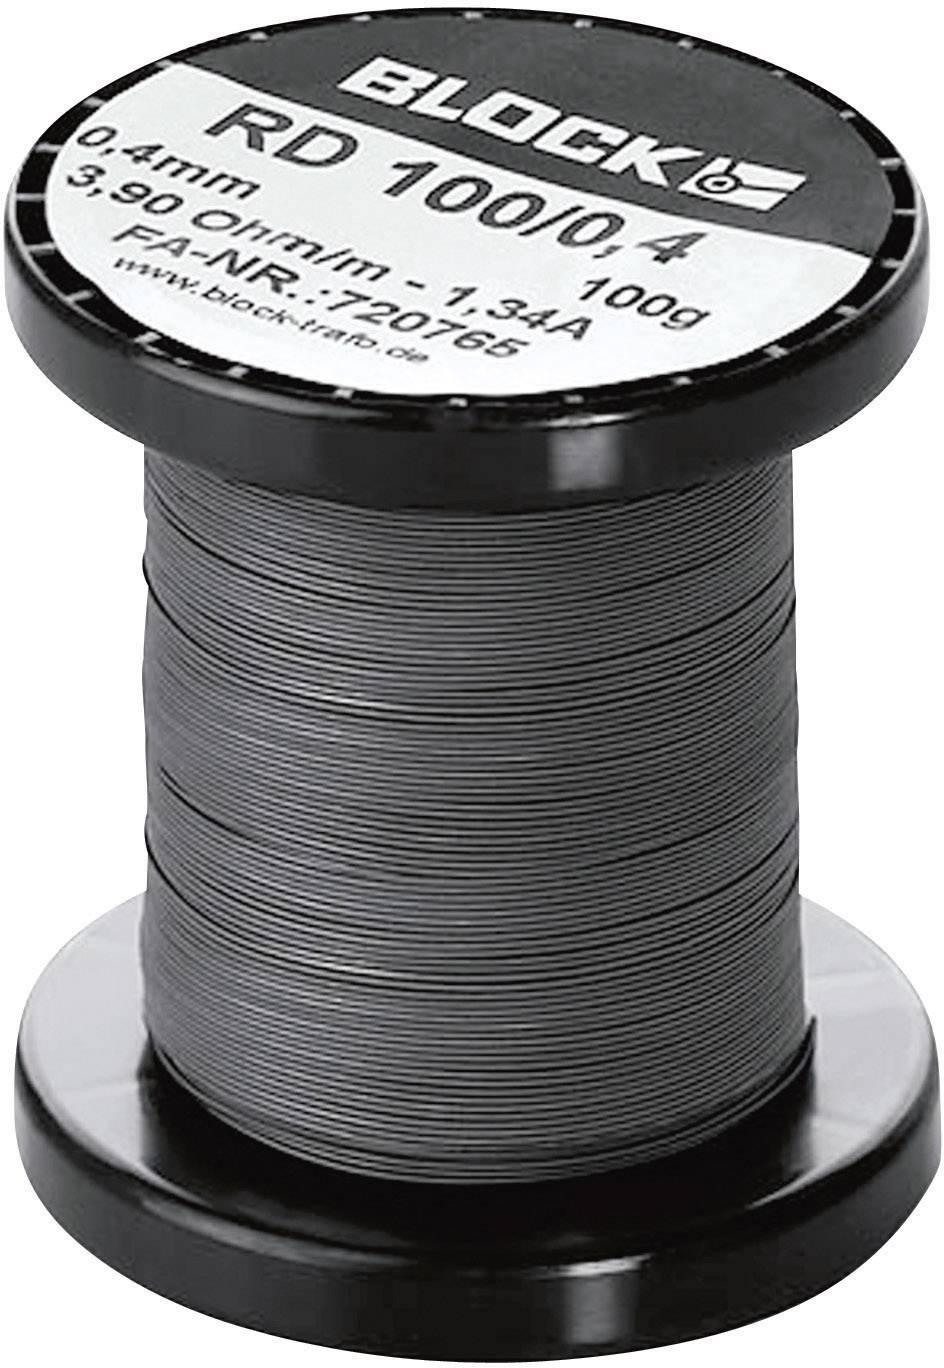 Odporový drát (konstantan) 1.73 Ω/m Block RD 100/0,6 39 m